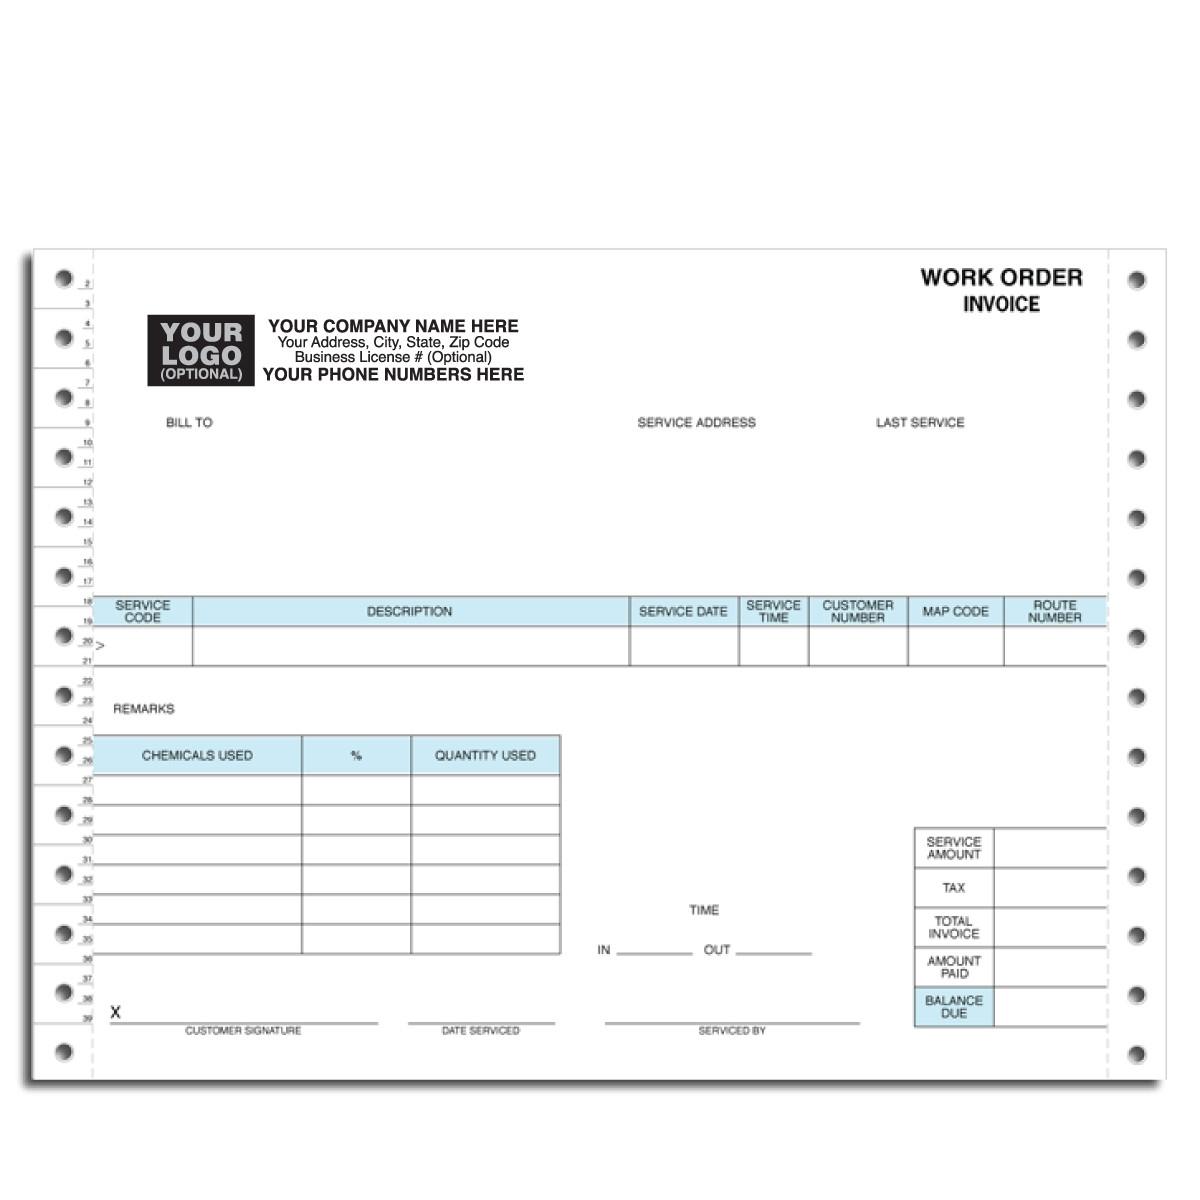 work order invoice invoic work order invoice sample work order invoice order form